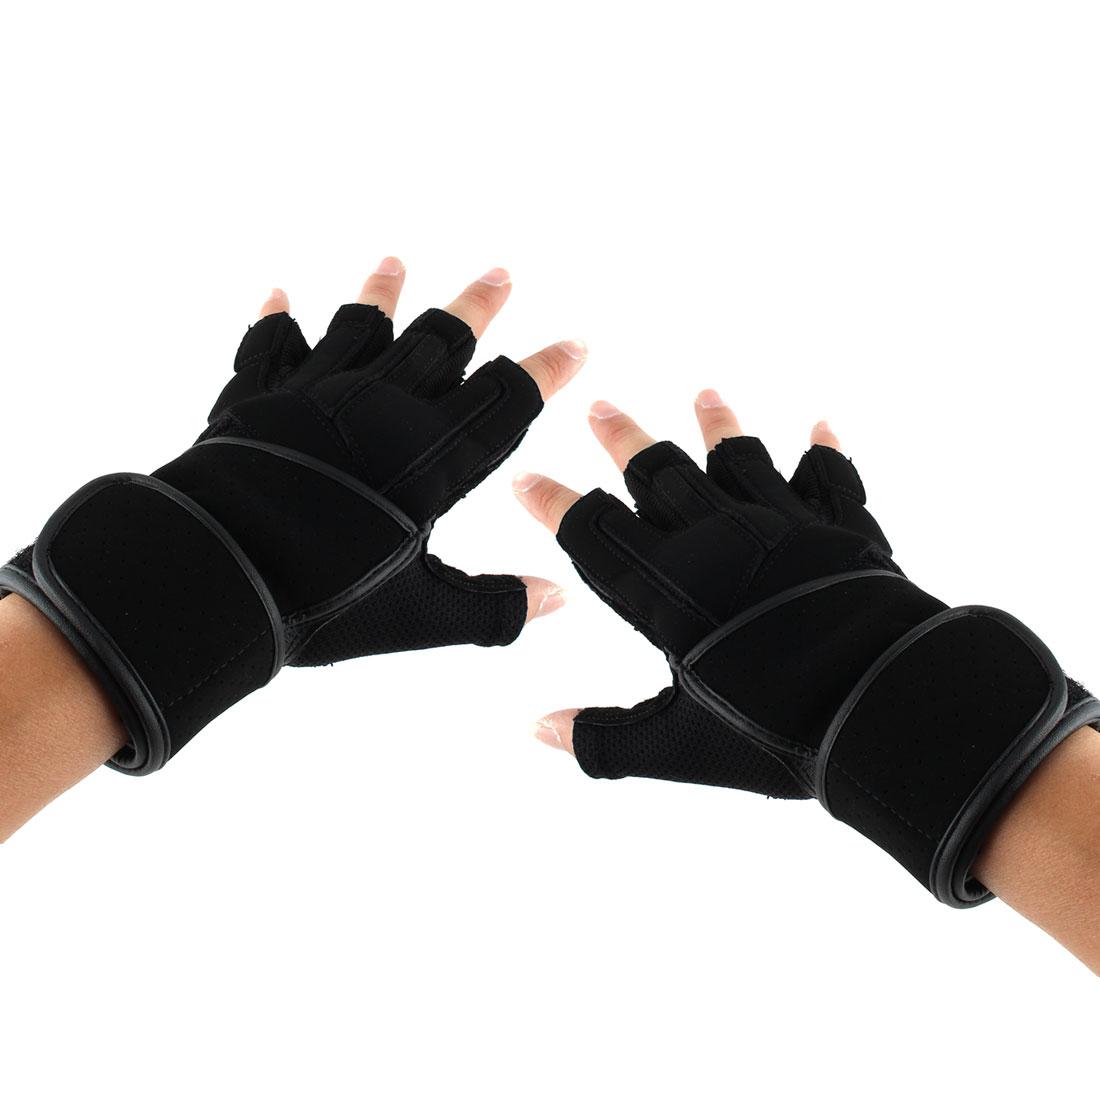 Men PU Leather Adjustable Sports Training Workout Half Finger Fitness Gloves Black M Pair